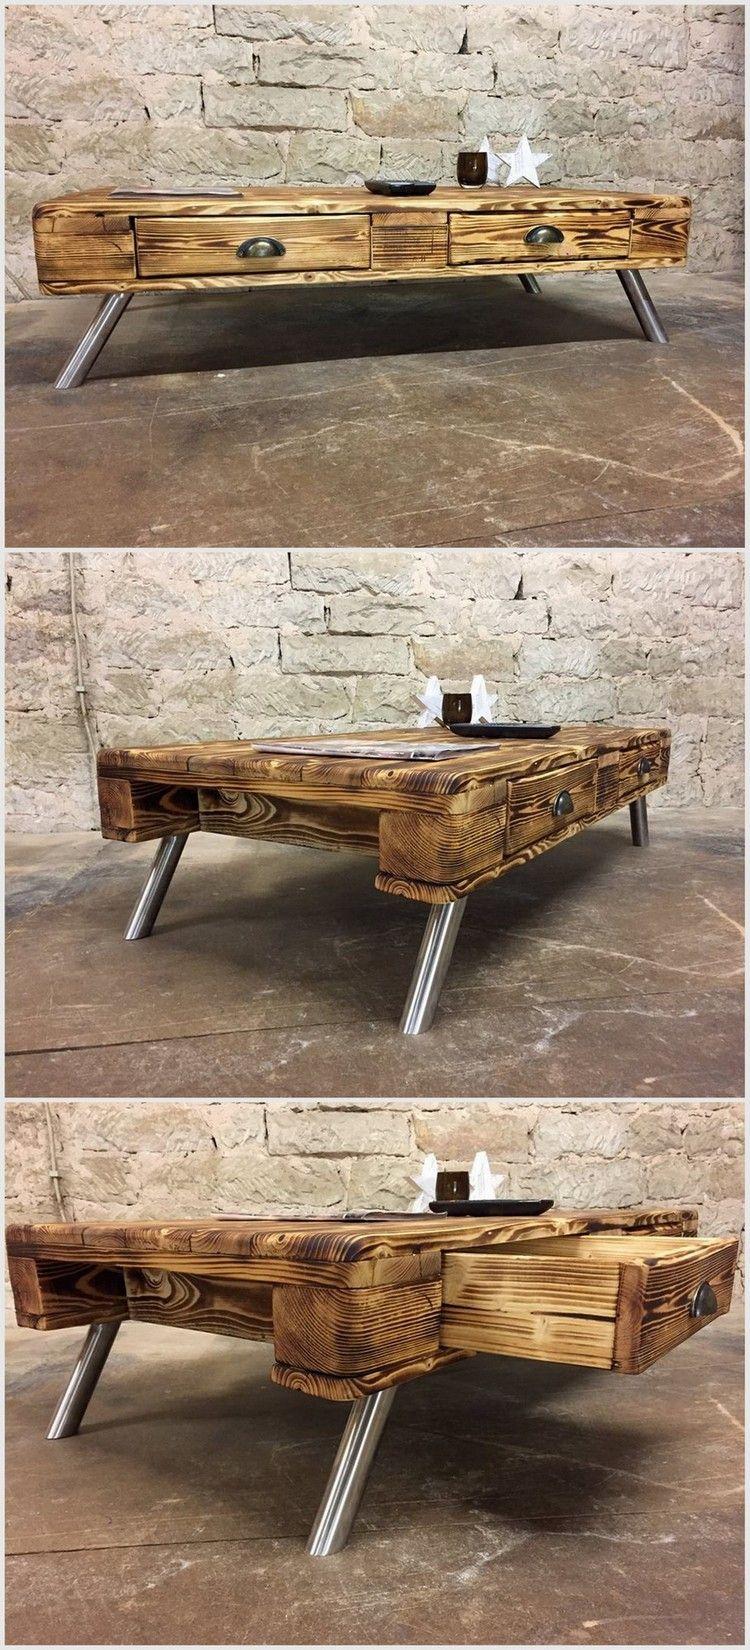 inspire your guests with awesome wood pallet creations kreativ design m bel palette und. Black Bedroom Furniture Sets. Home Design Ideas